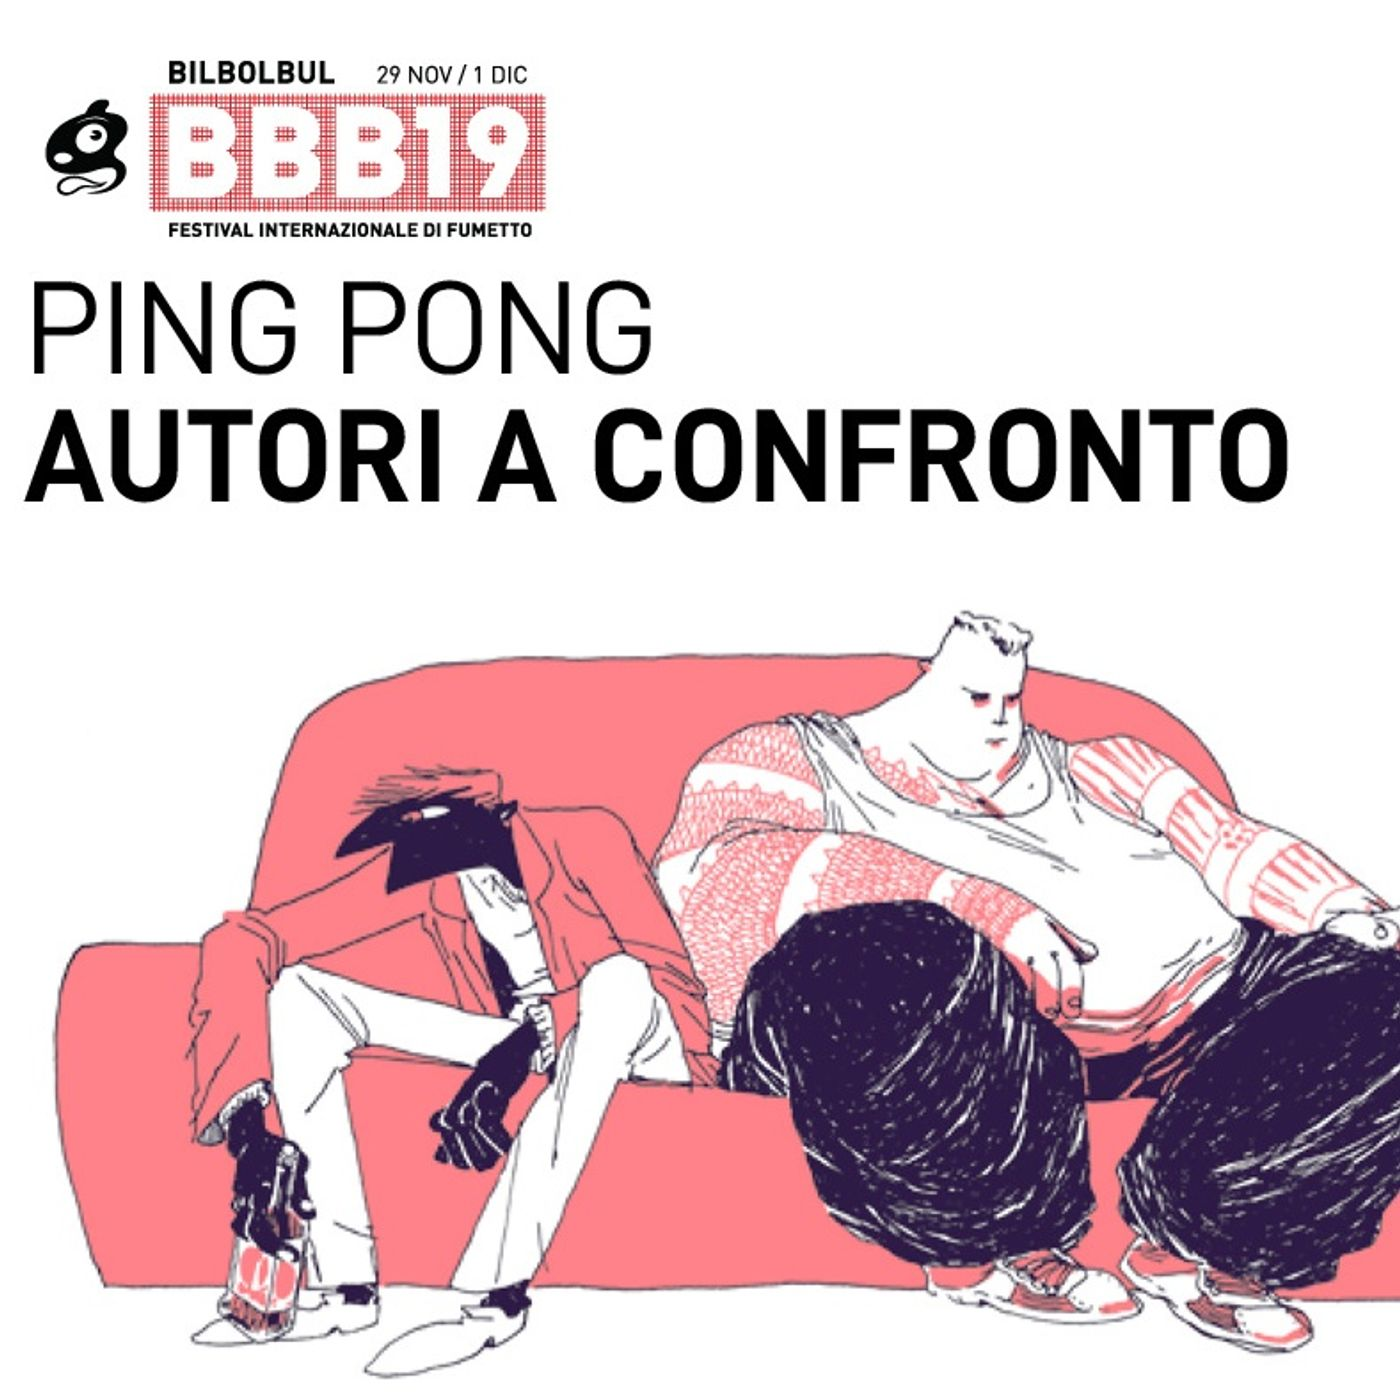 [Ping Pong] Silvia Rocchi ed Eliana Albertini